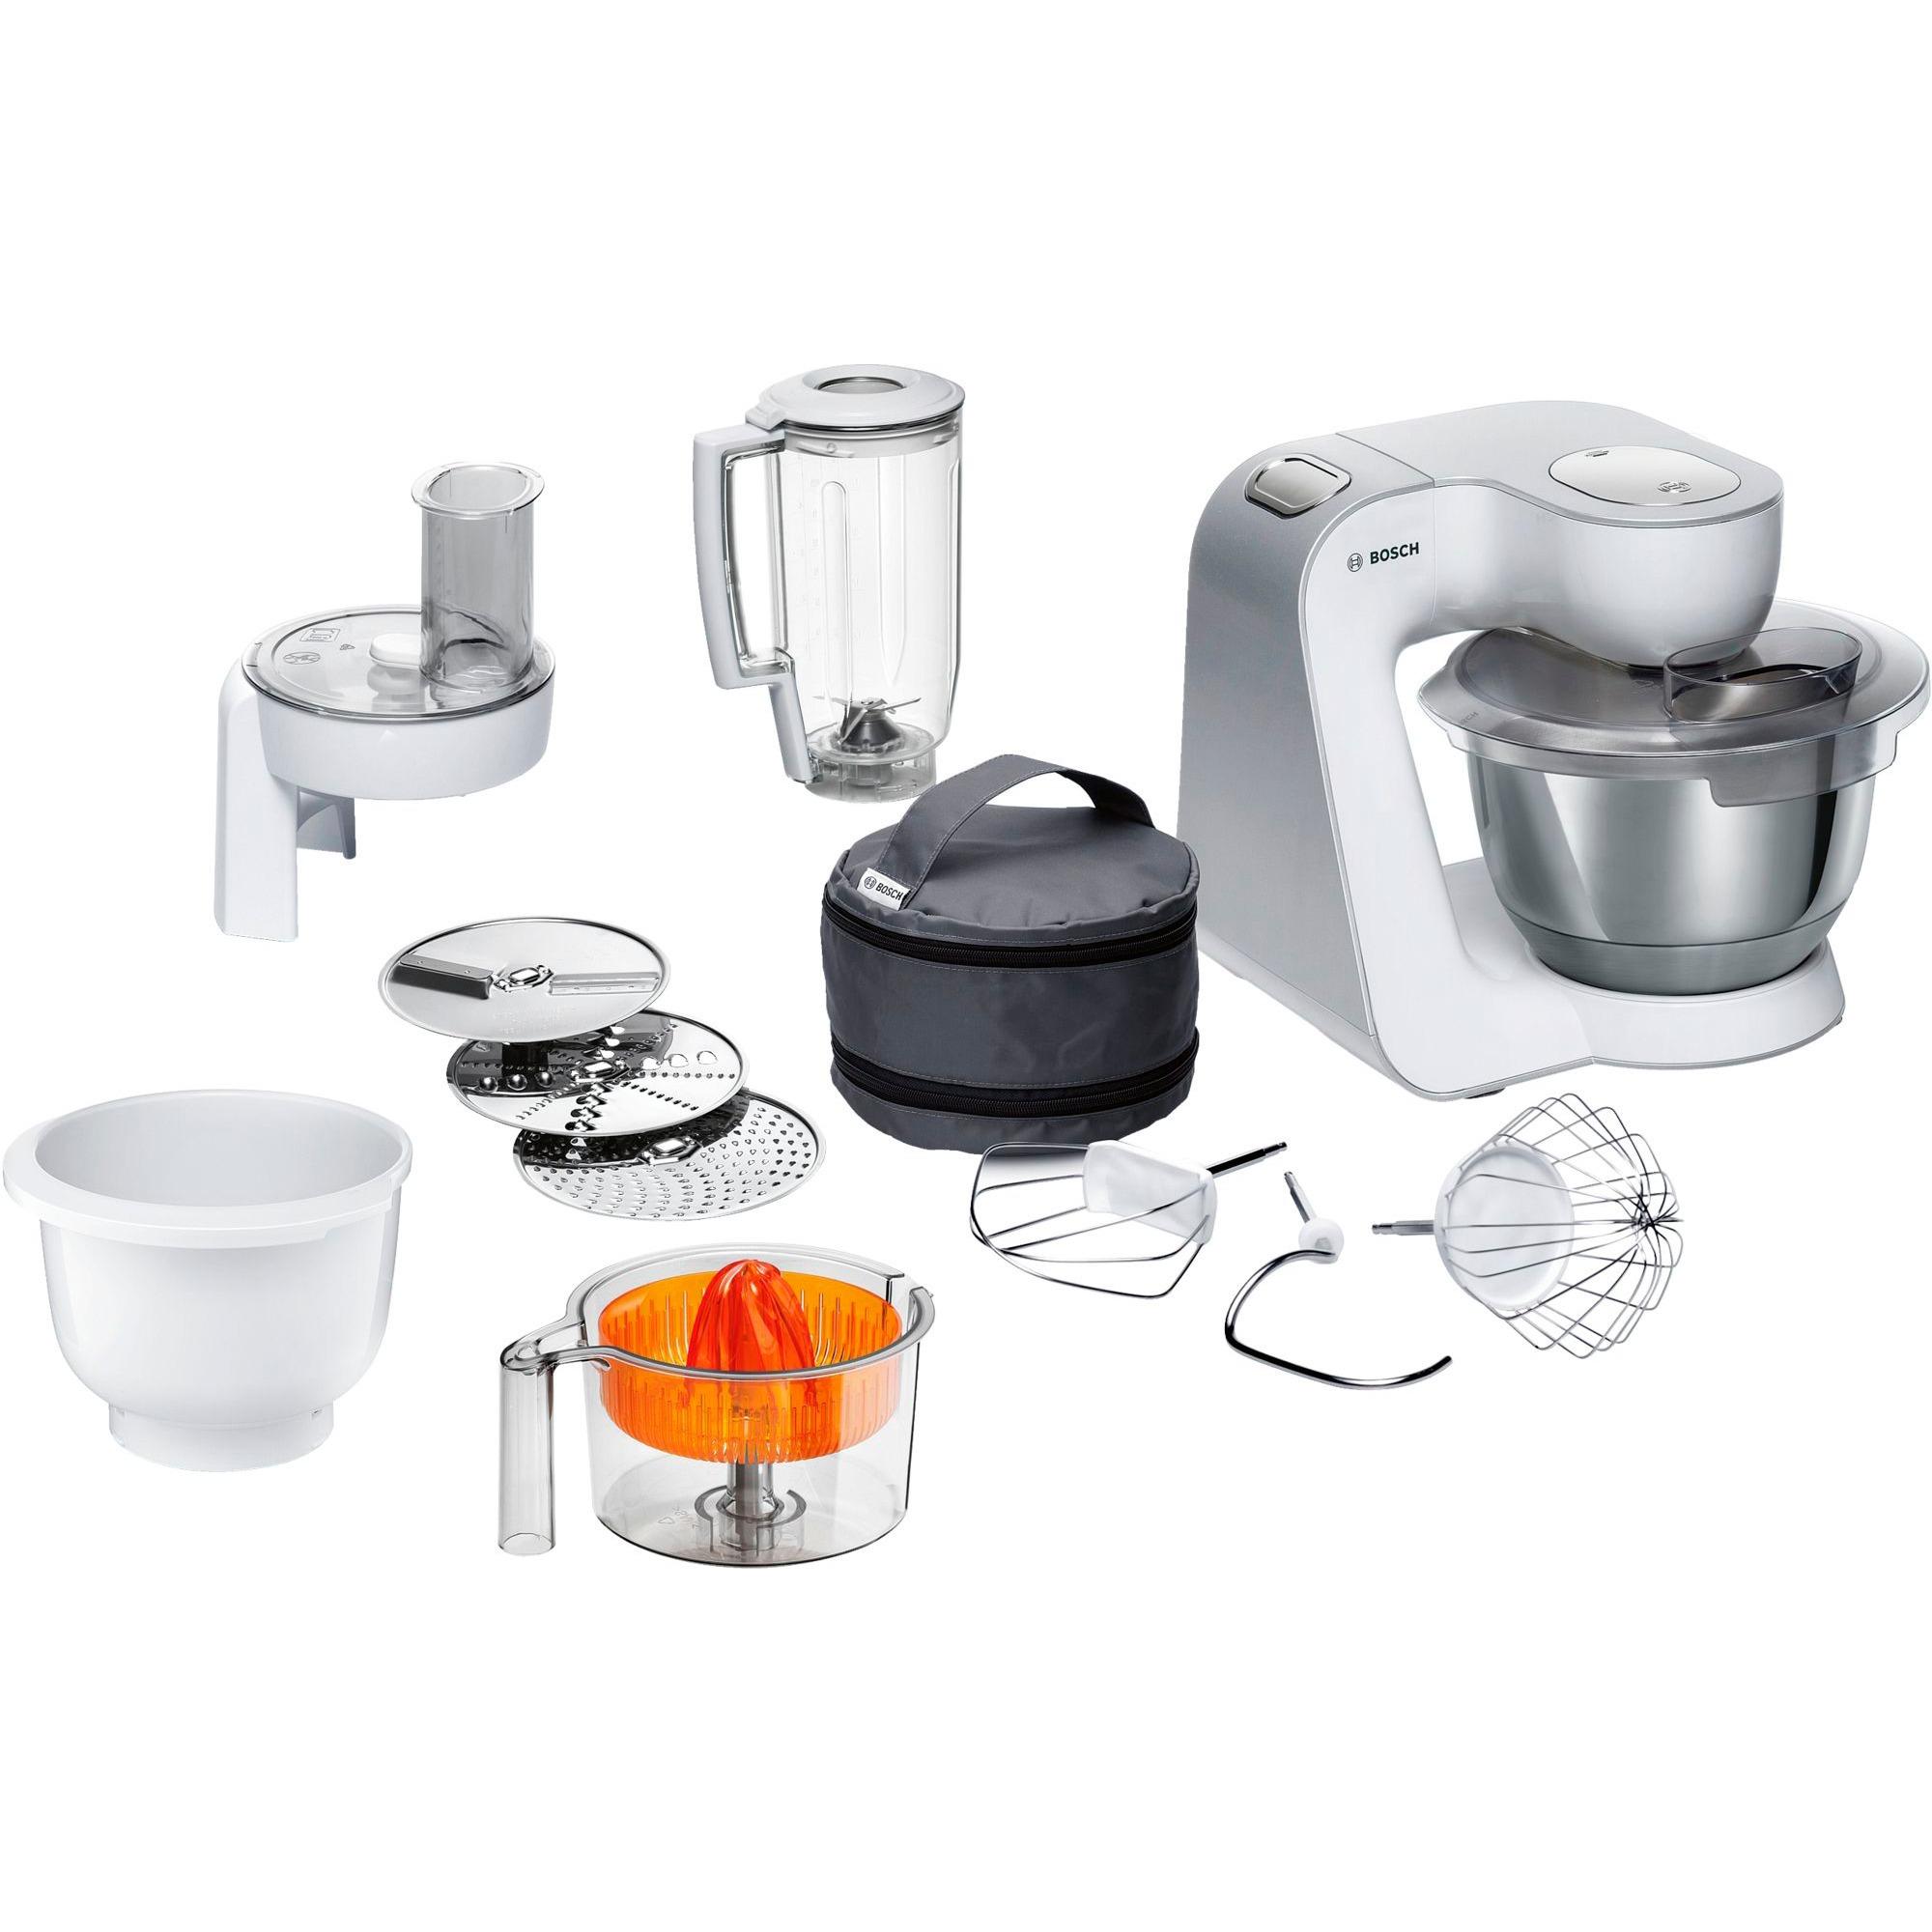 MUM5 CreationLine MUM58243 1000W 3.9L Blanco robot de cocina